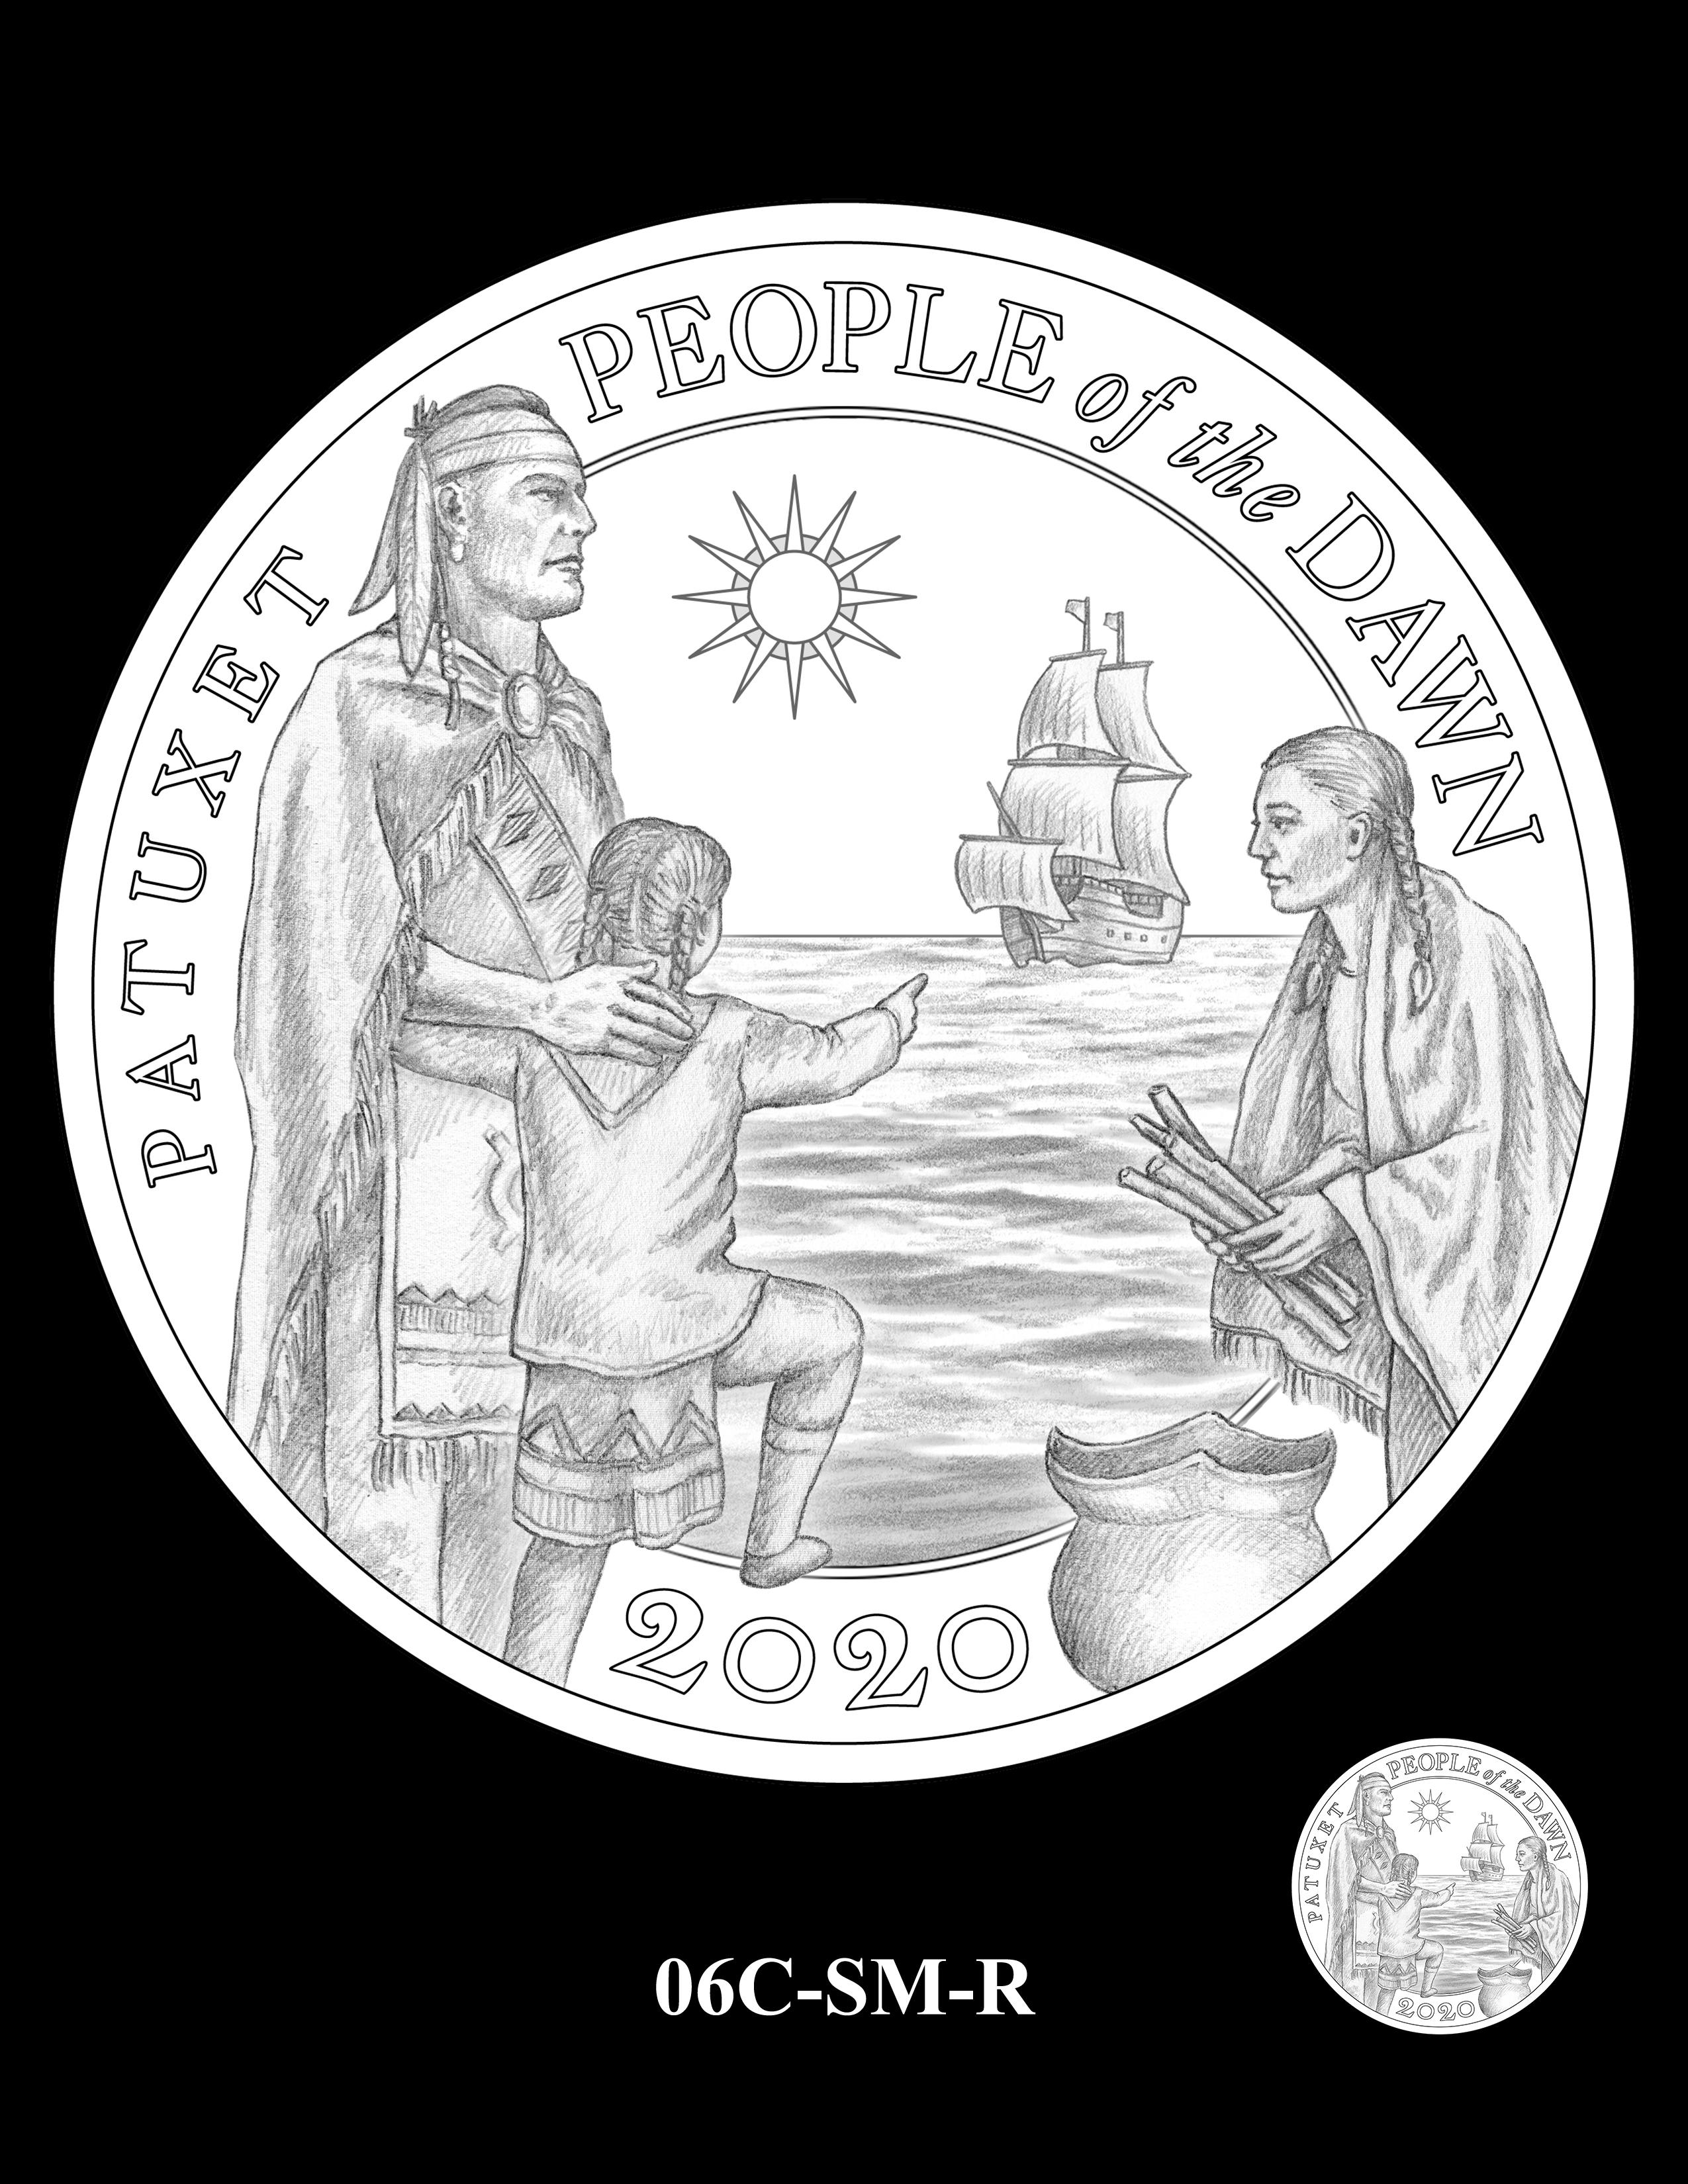 06C-SM-R - 2020 Mayflower 400th Anniversary 24K Gold Coin & Silver Medal Program